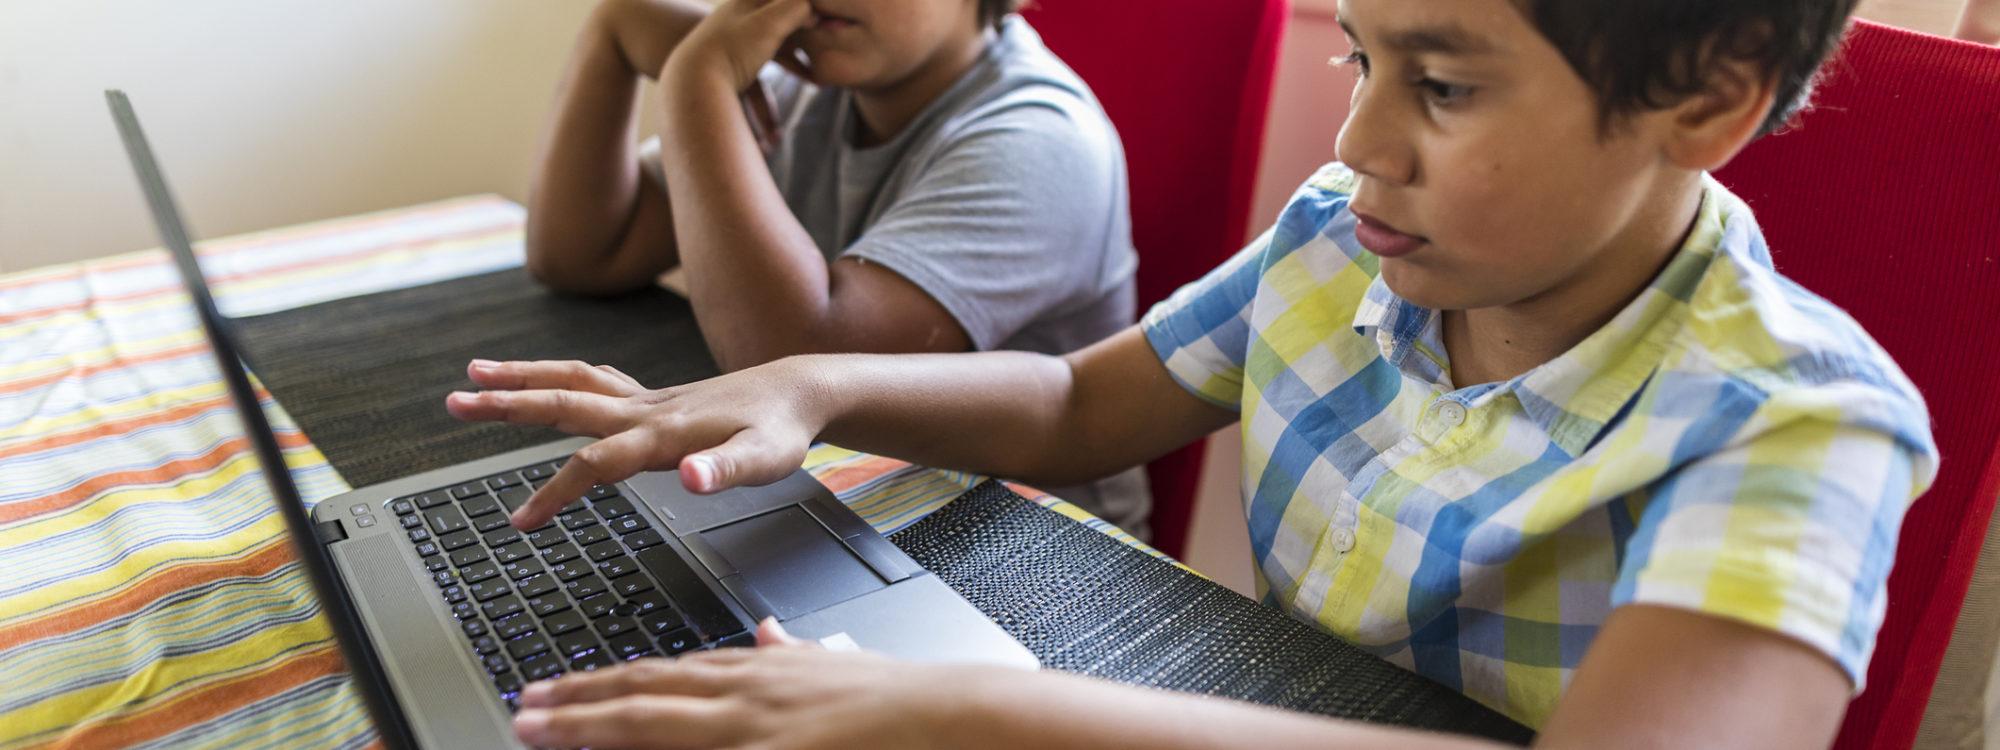 students sharing laptop